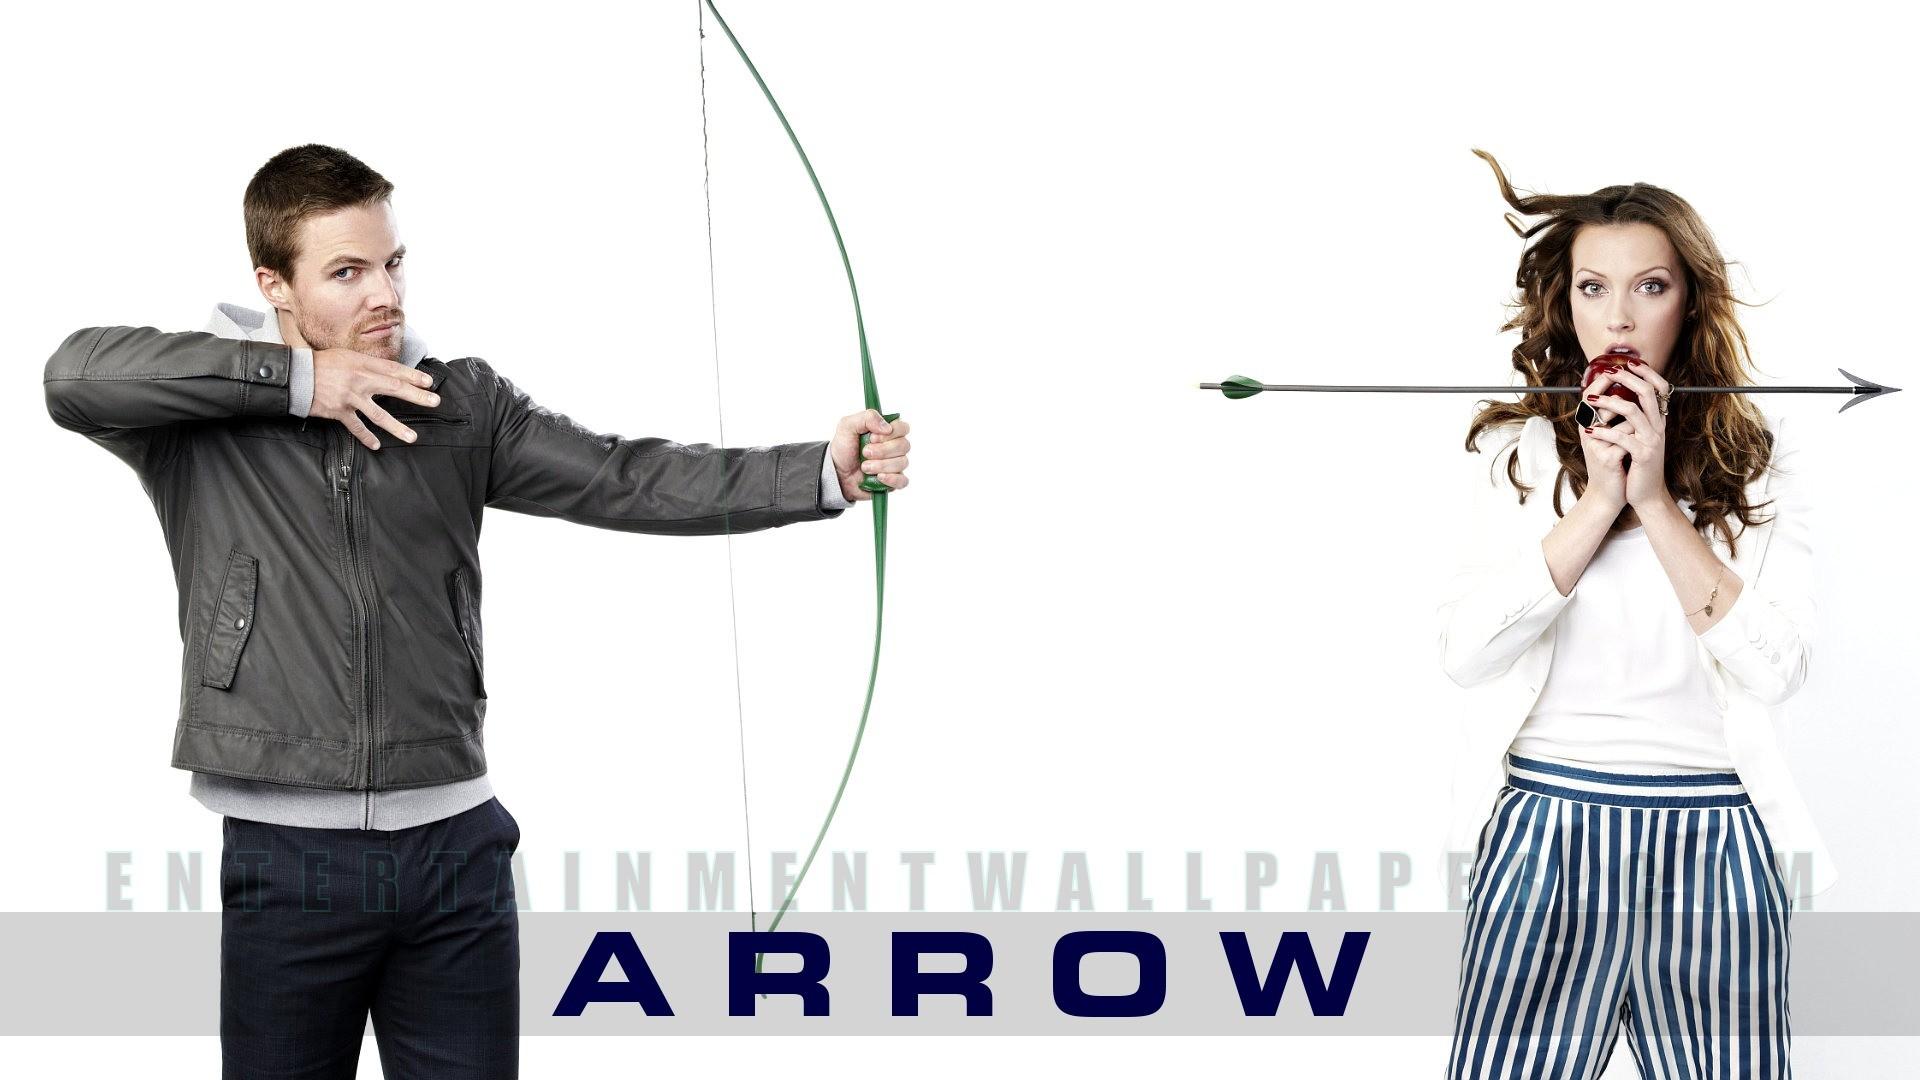 Arrow Wallpaper – Original size, download now.